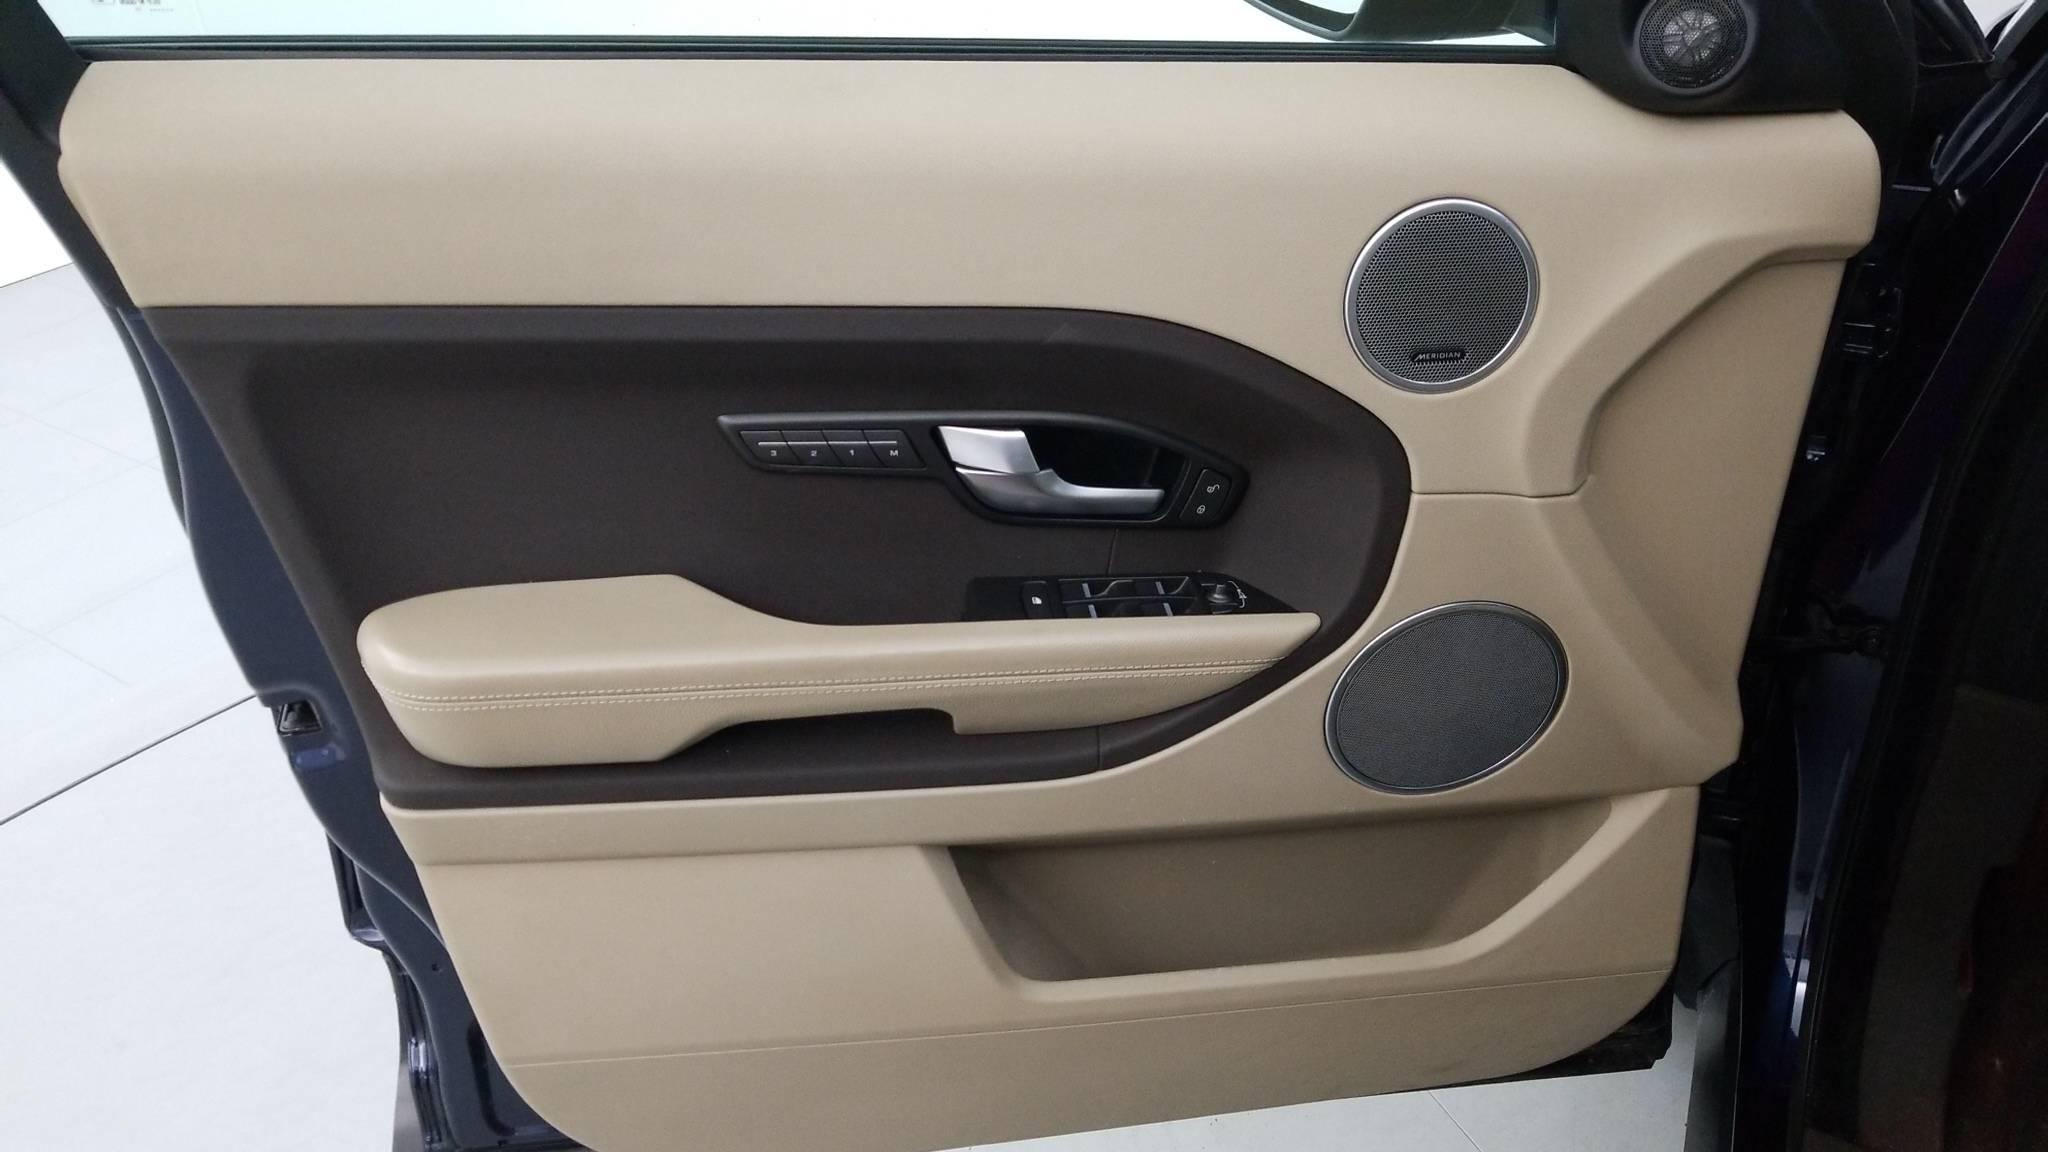 Pre-Owned 2015 Land Rover Range Rover Evoque Pure Plus